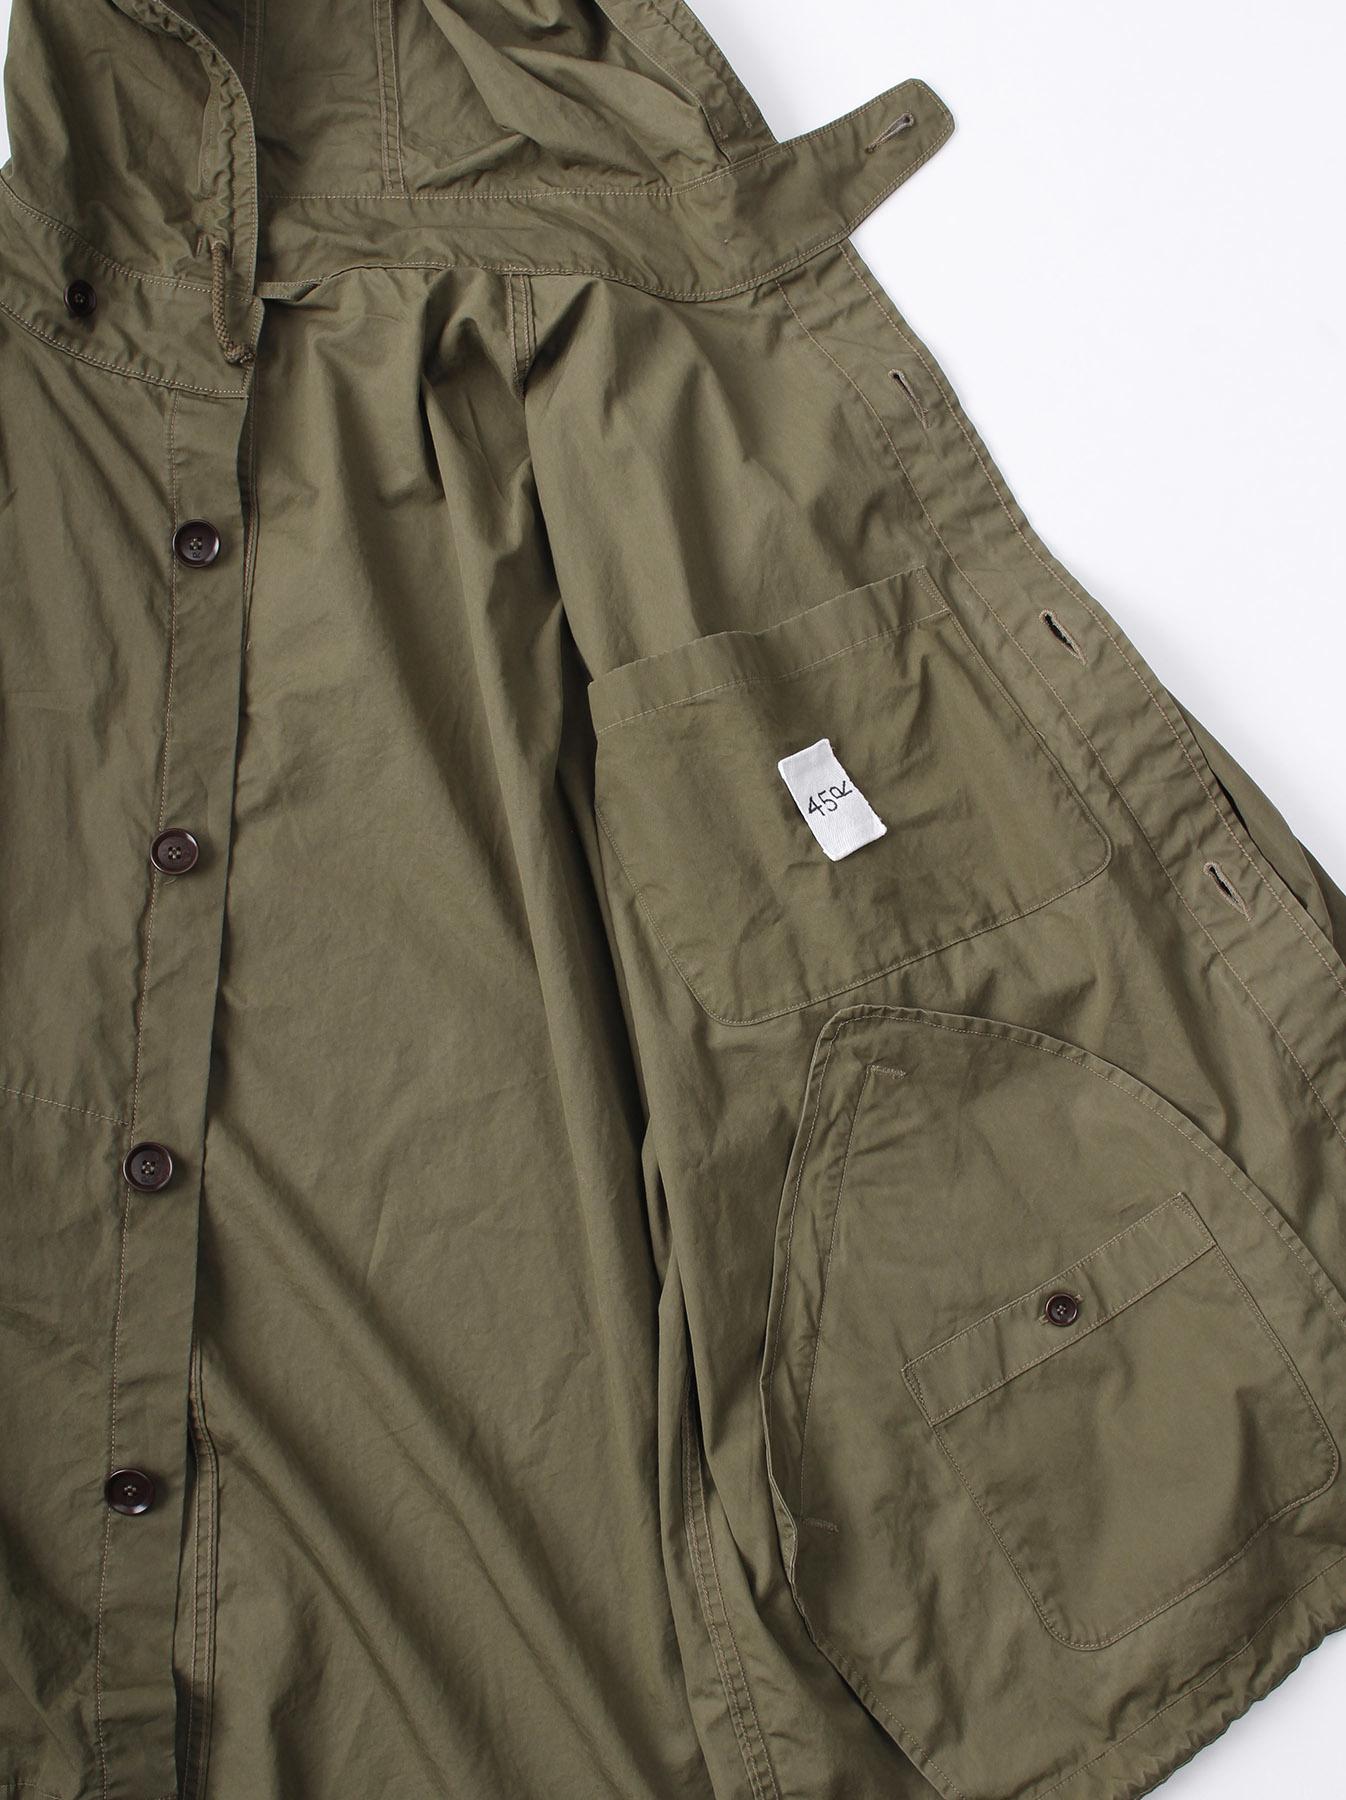 Weather Cloth Umahiko Mods Hoodie-9